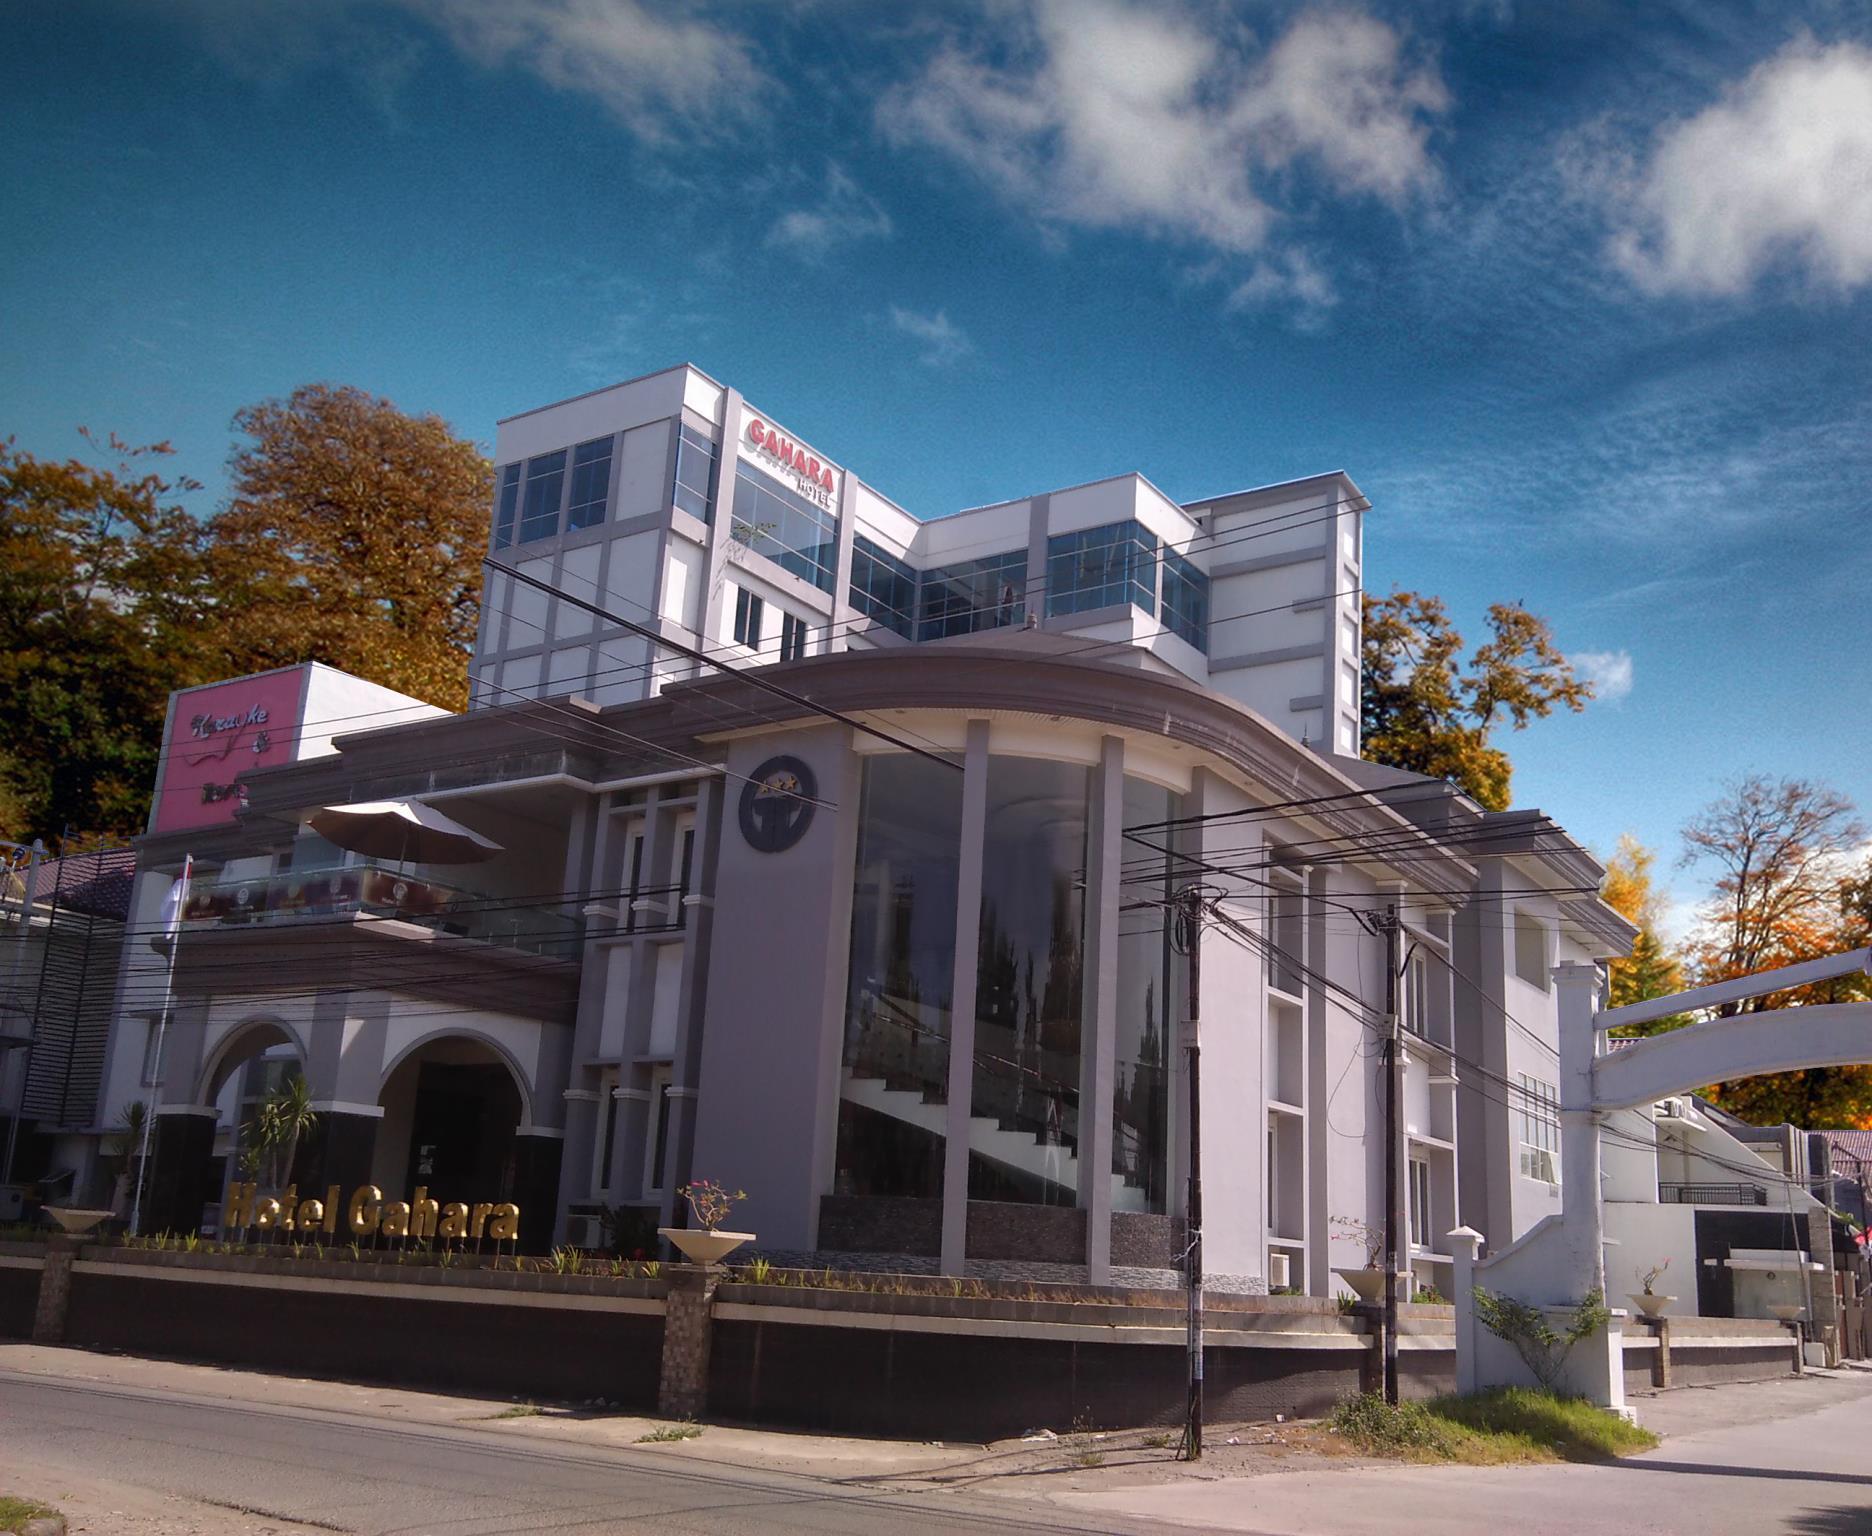 Gahara Hotel